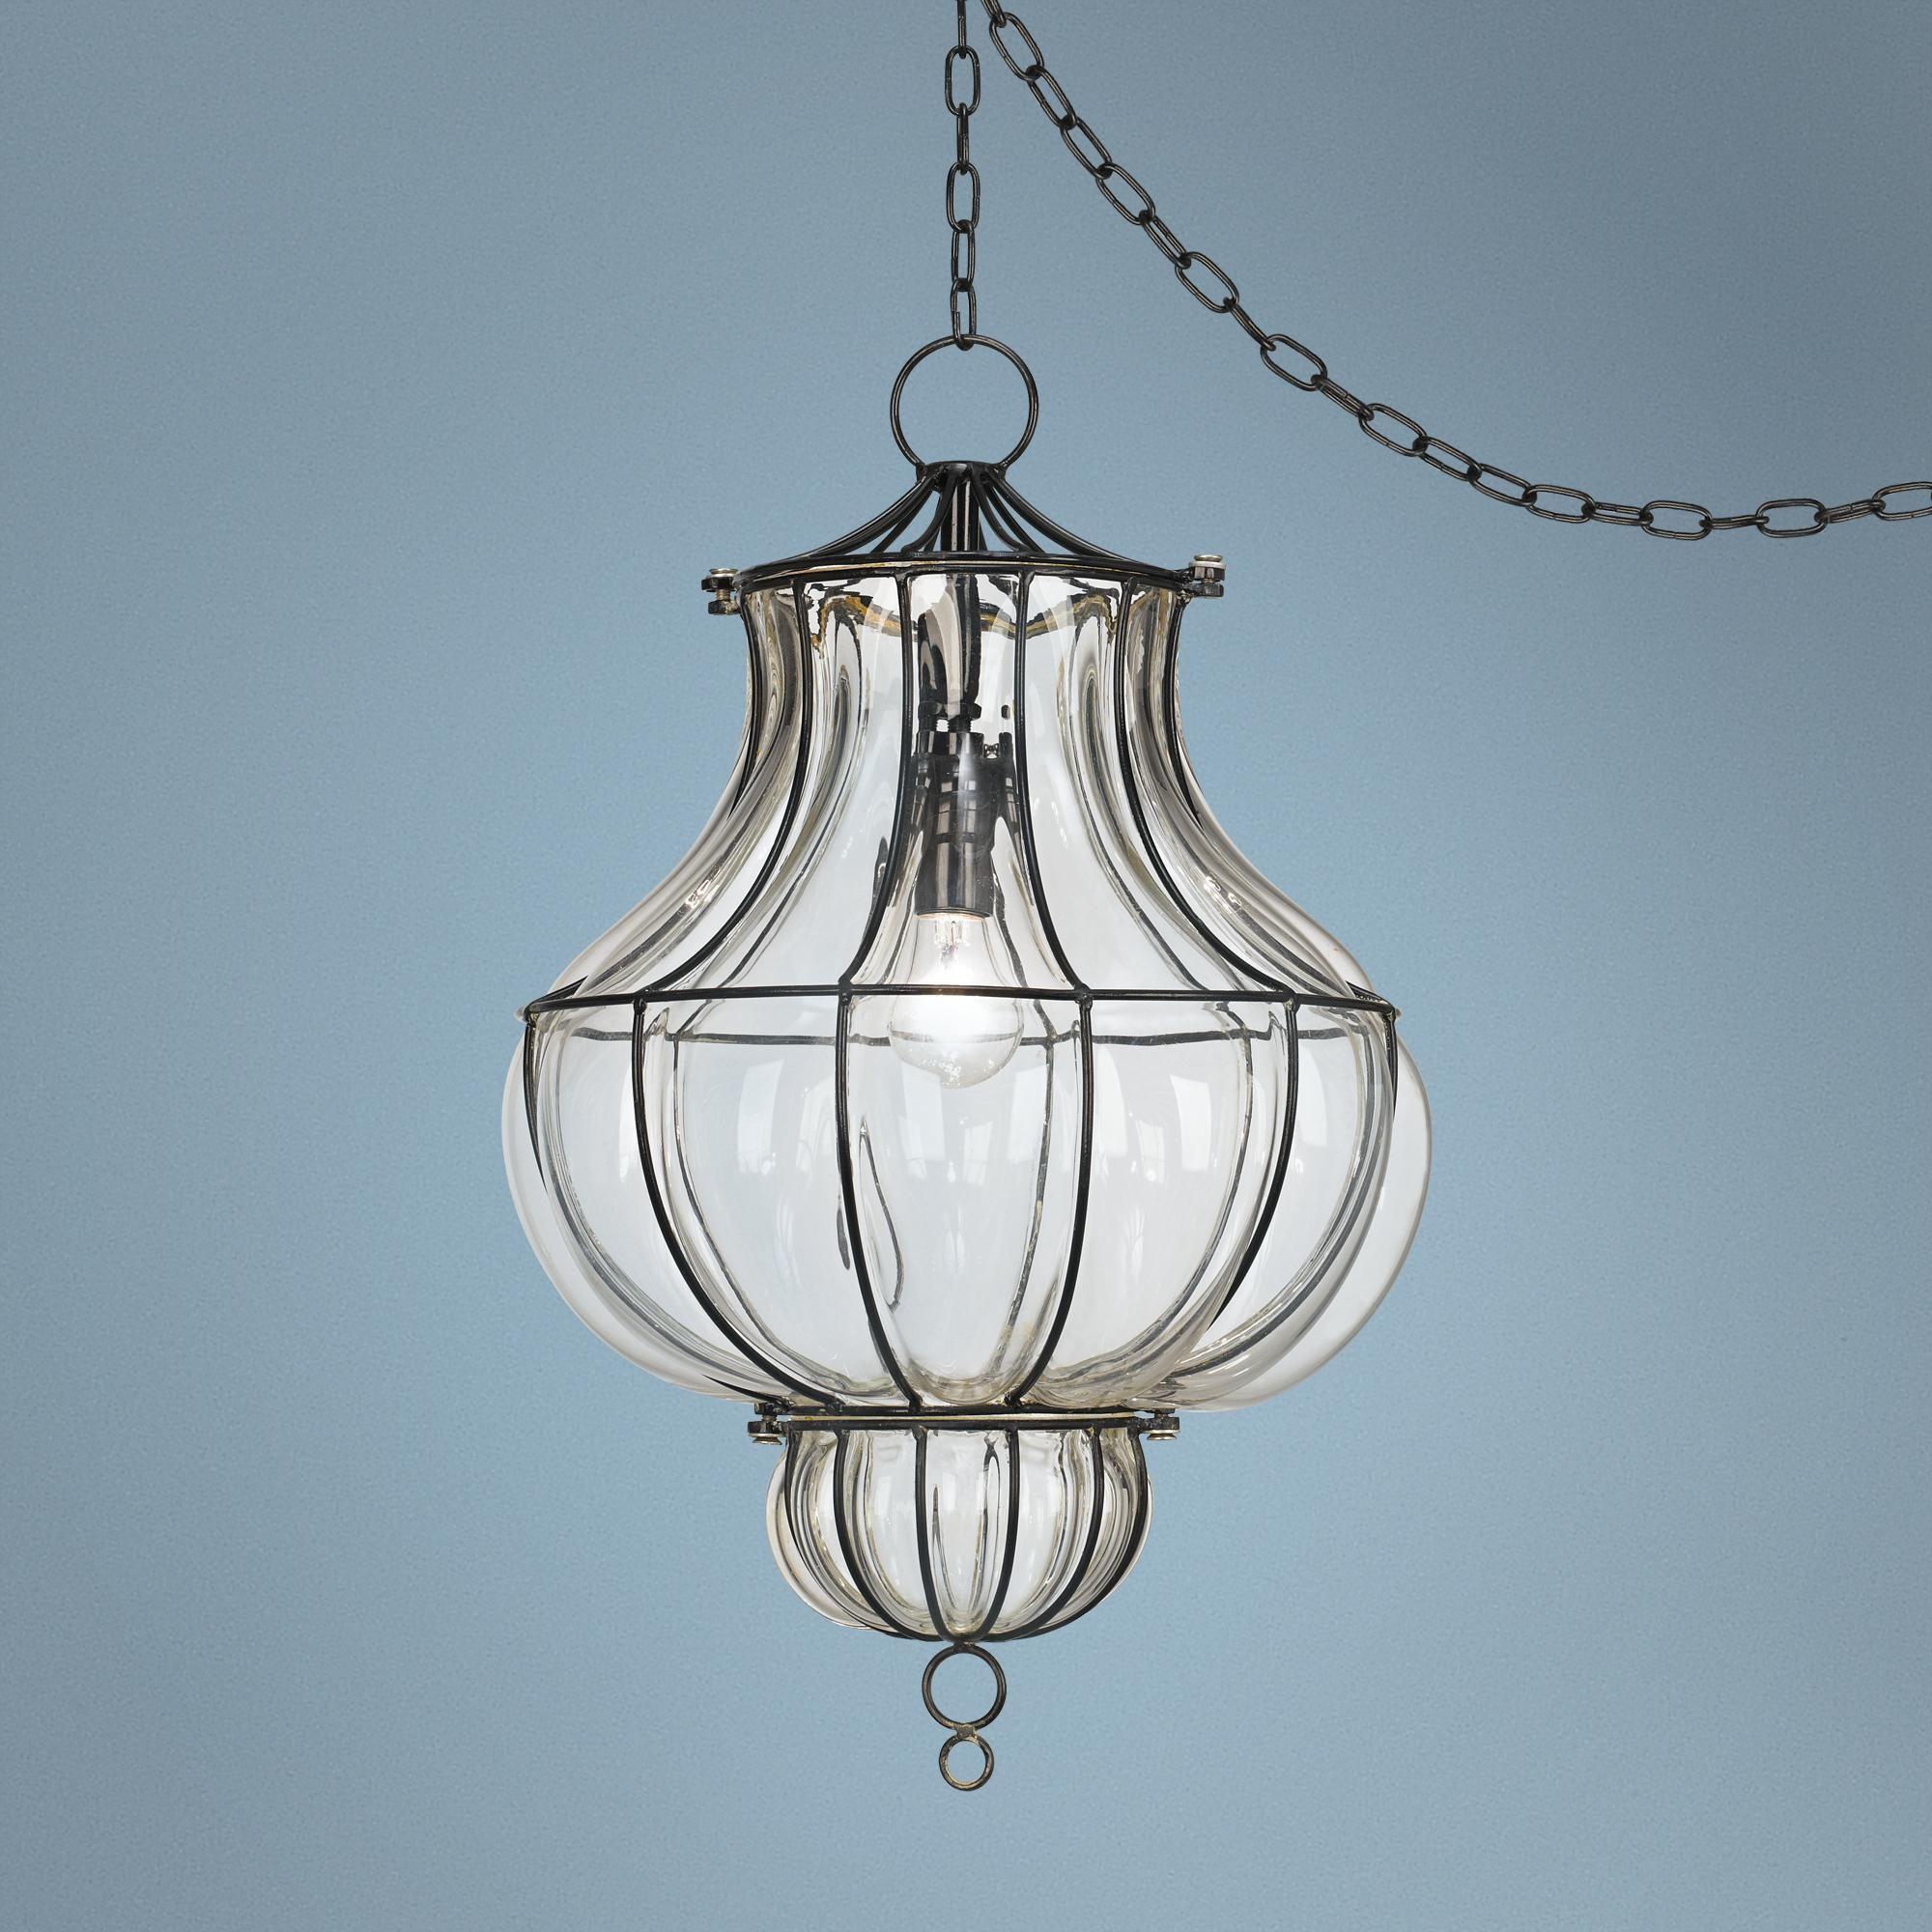 Centinela Lantern 12 Wide Glass Plug In Swag Chandelier W9242 Lamps Plus Swag Chandelier Plug In Pendant Light Swag Light